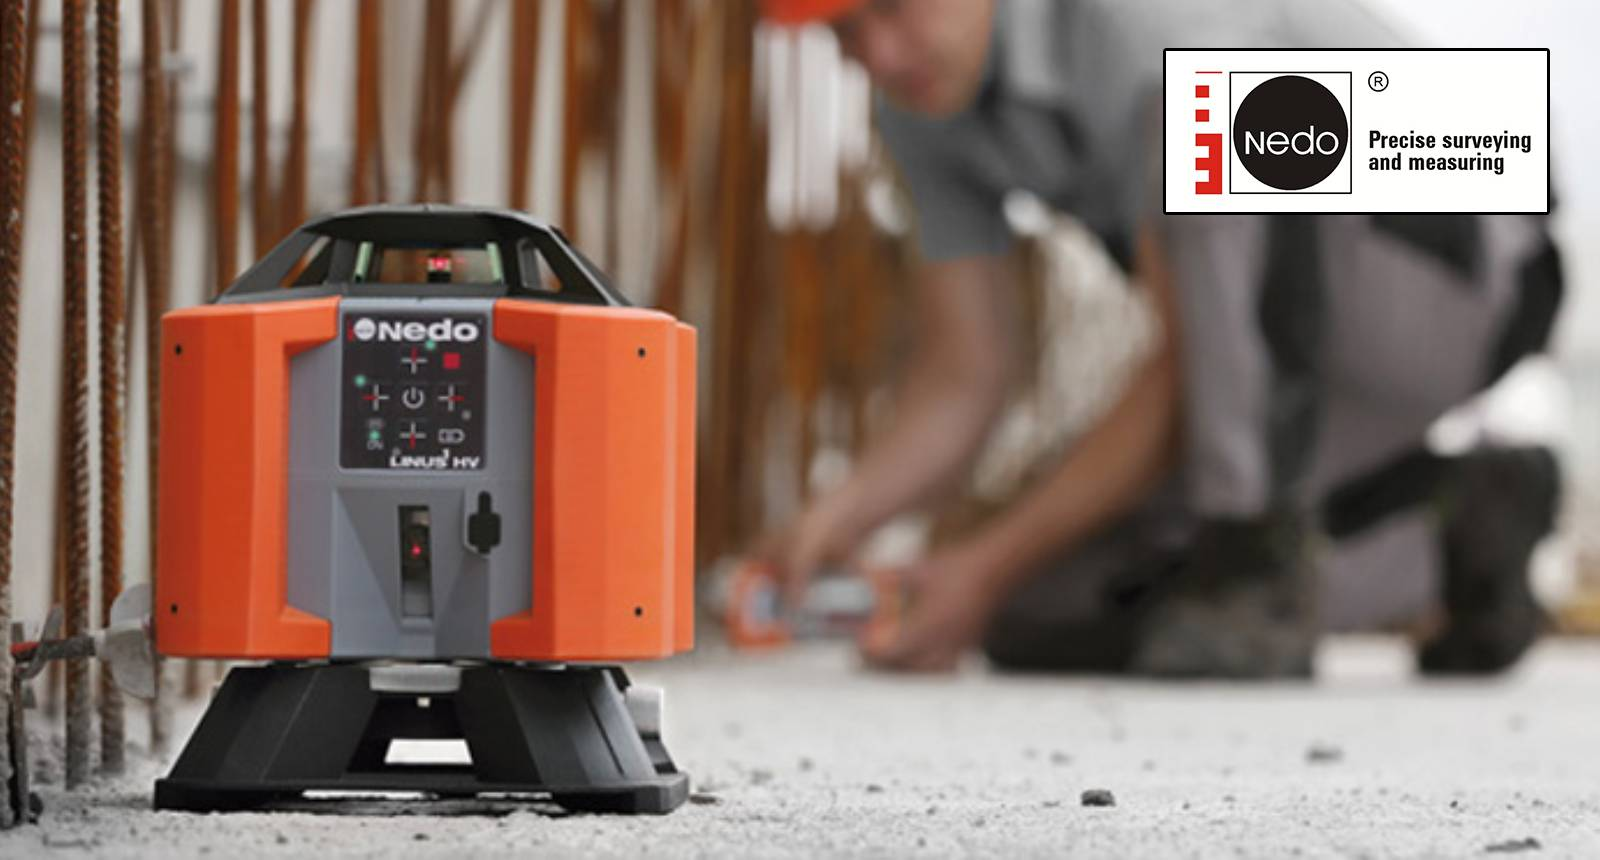 Buy DIY Building Materials, Shop Hardware Tools Online - Misar AE promo